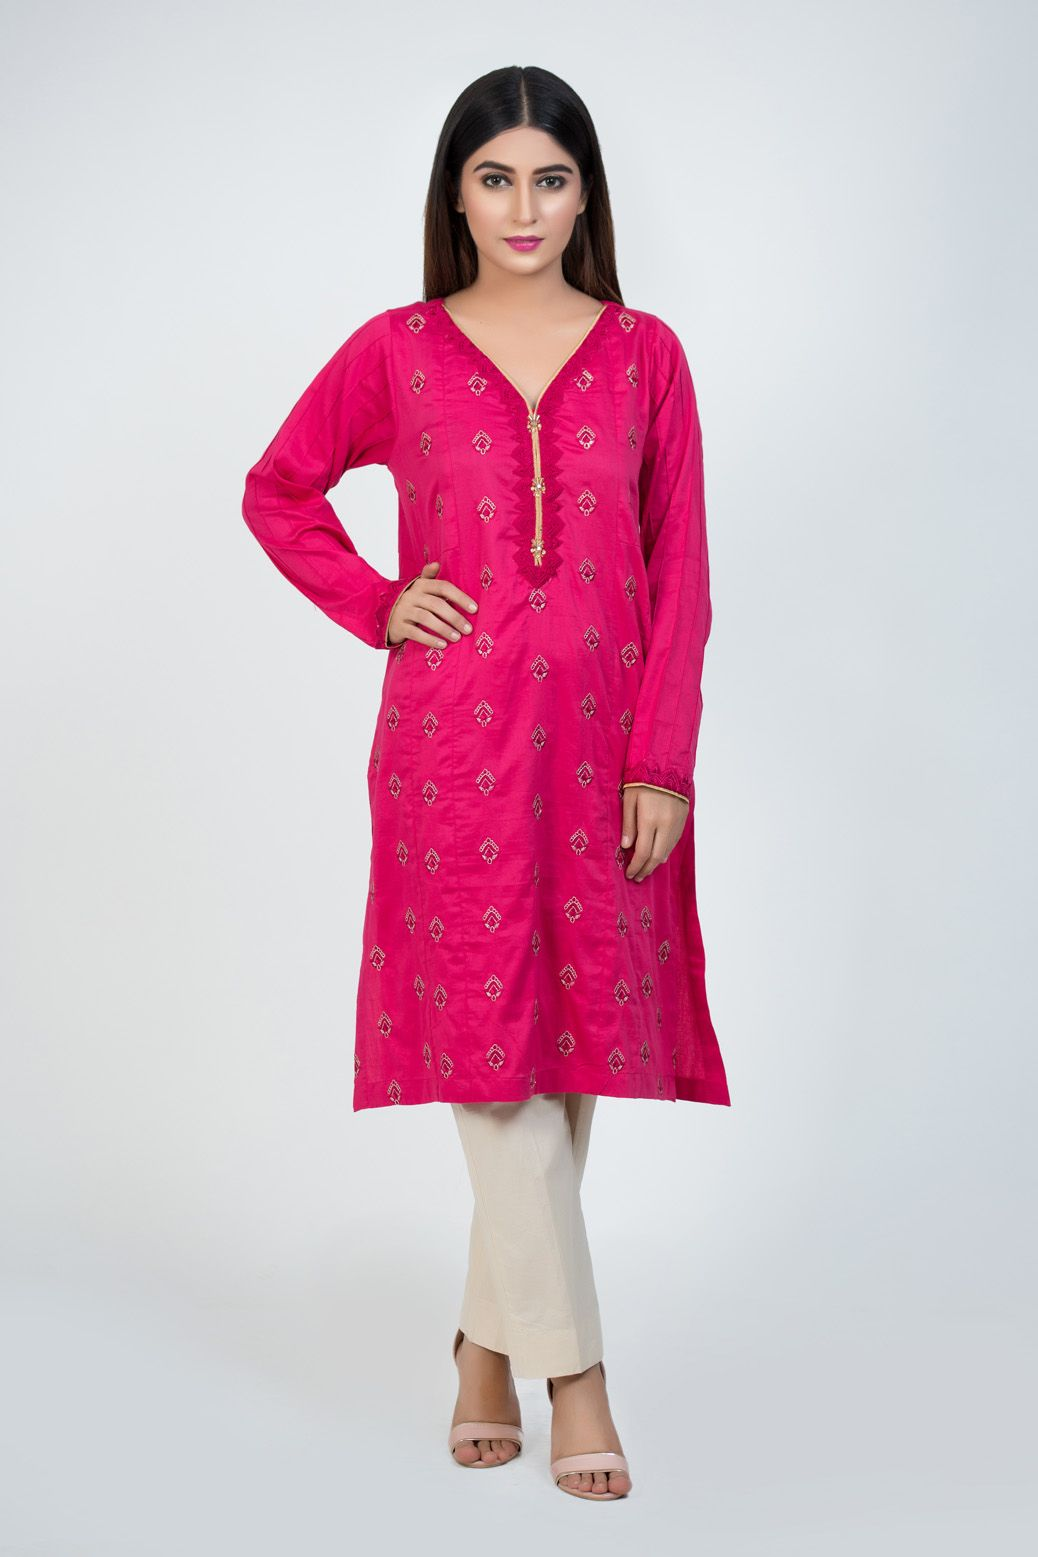 /2019/06/bonanza-satrangi-pink-cotton-satin-kurti-emsk91p007-pink-image1.jpeg